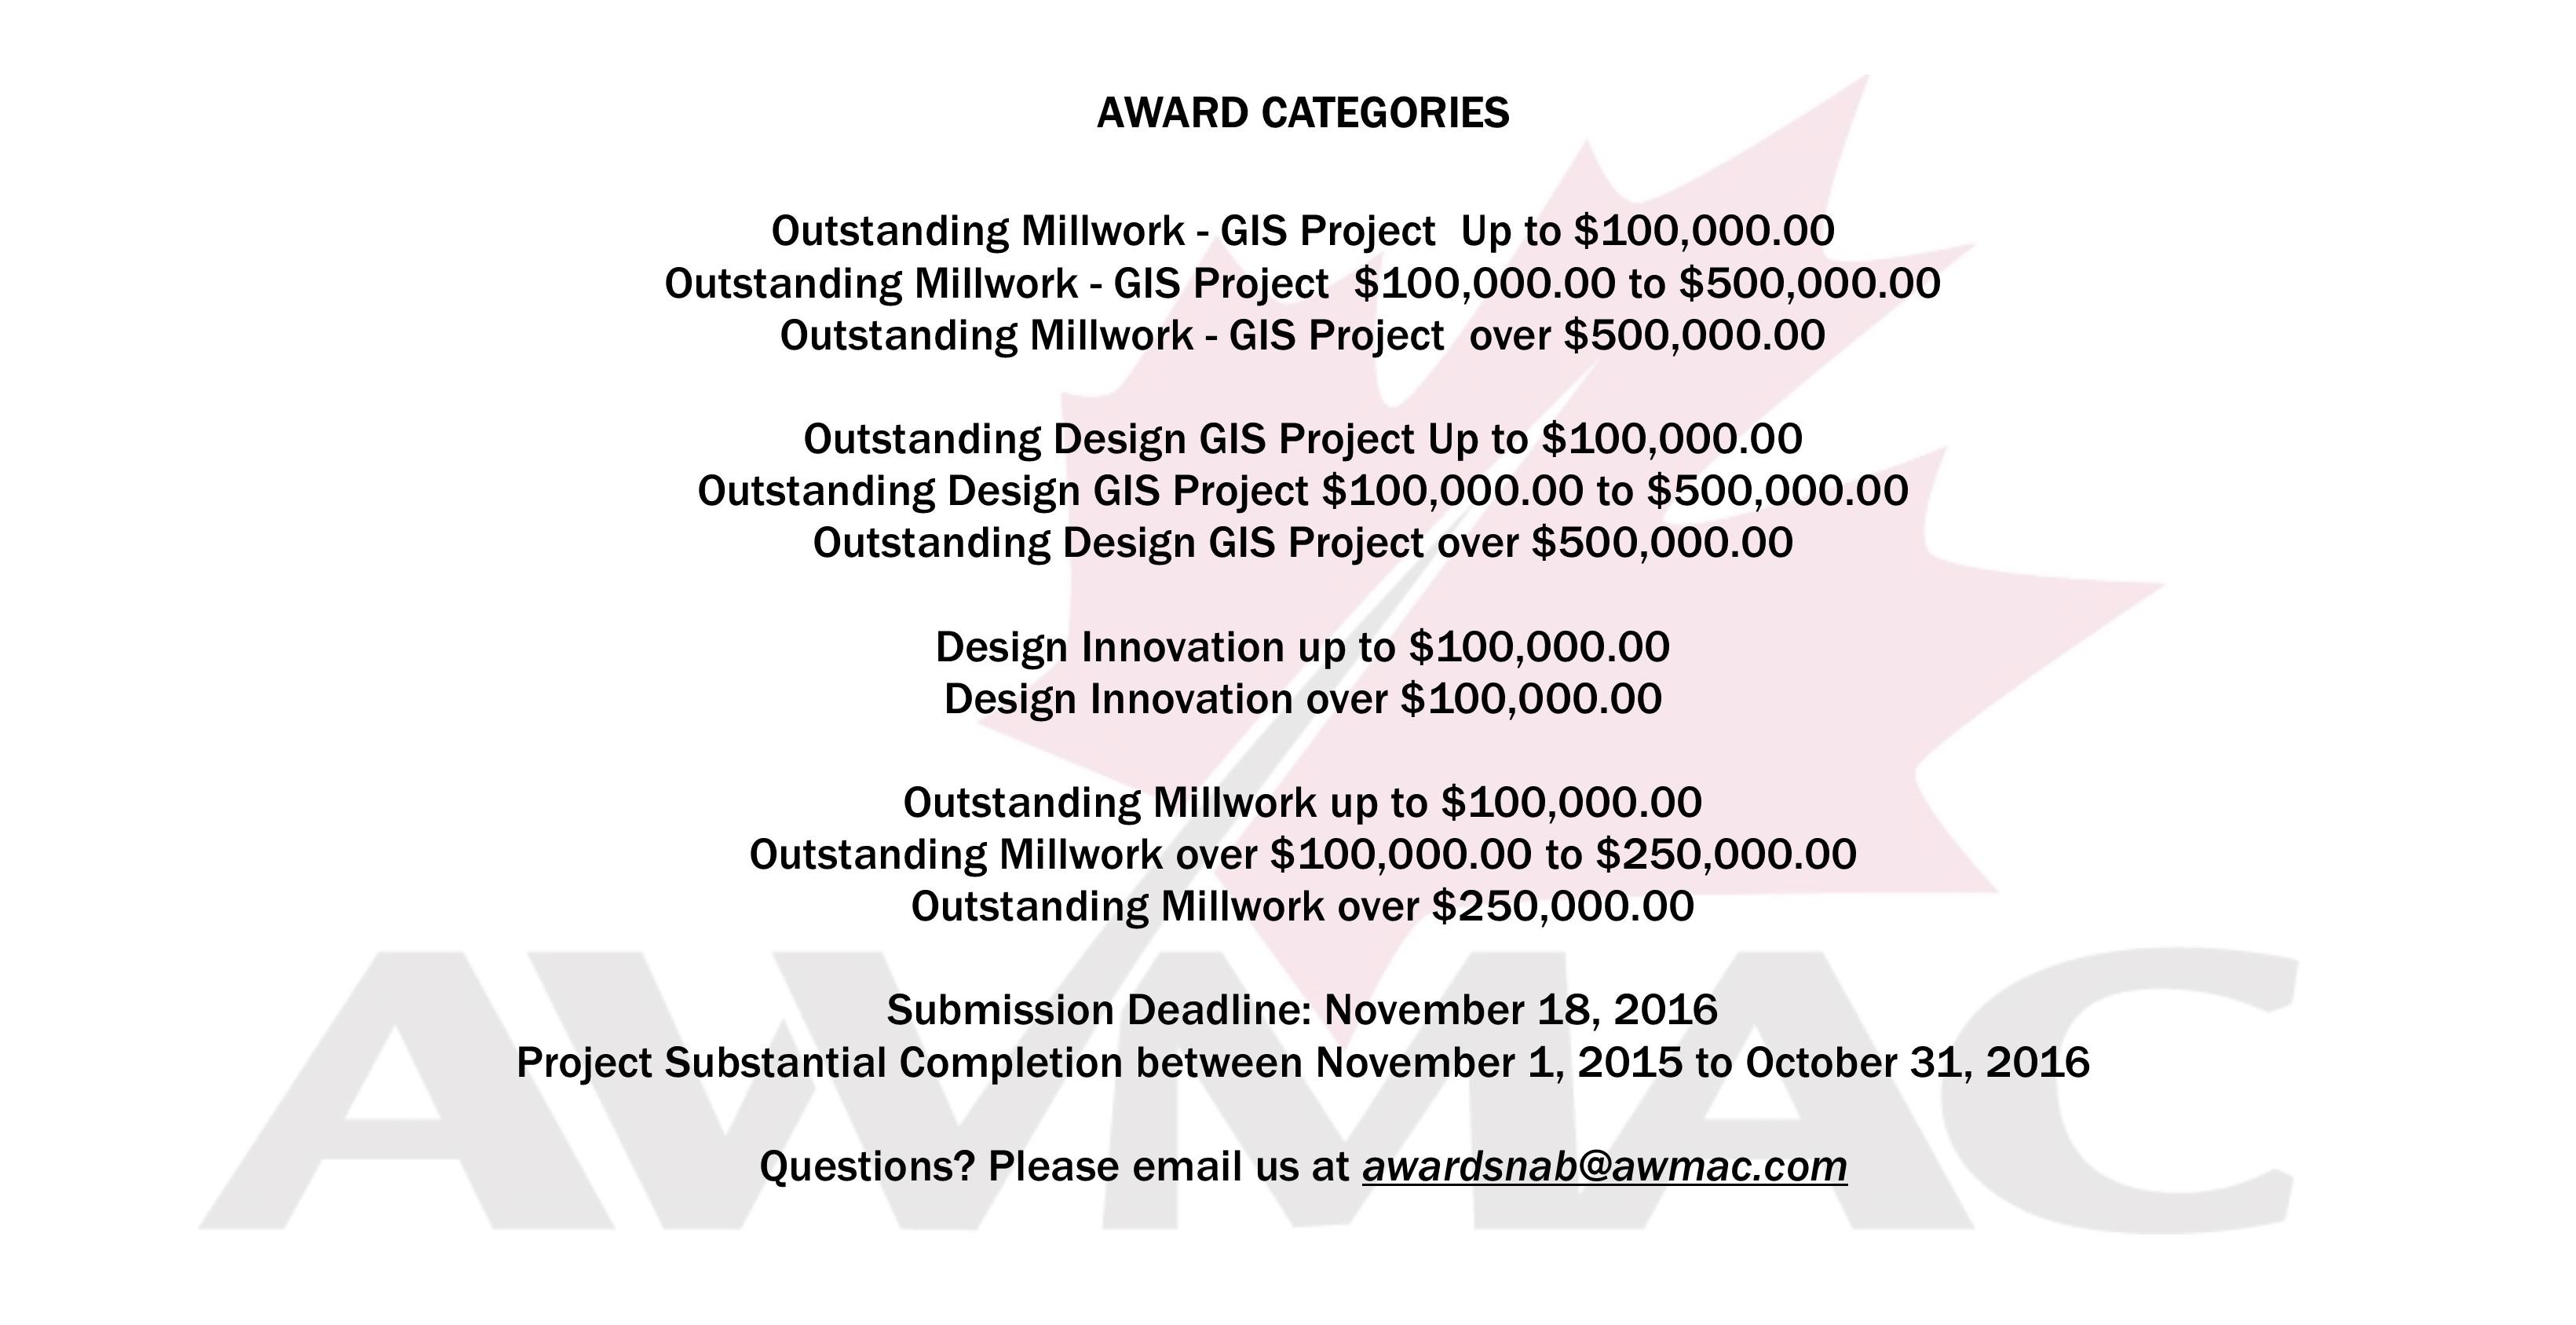 Awards Criteria